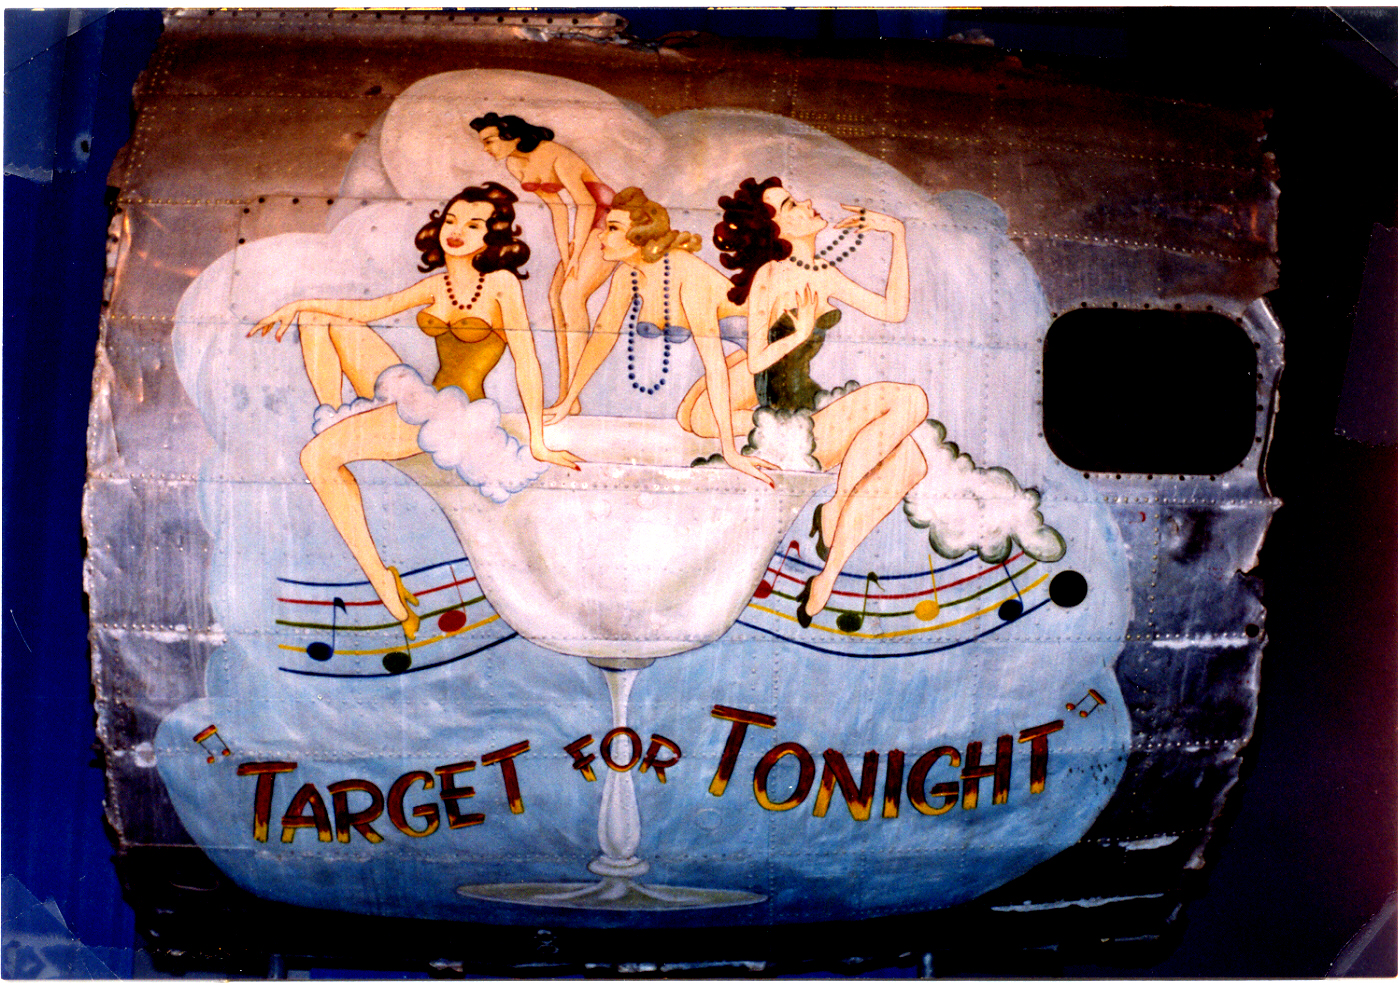 B-17 #44-8810 / Target for Tonight